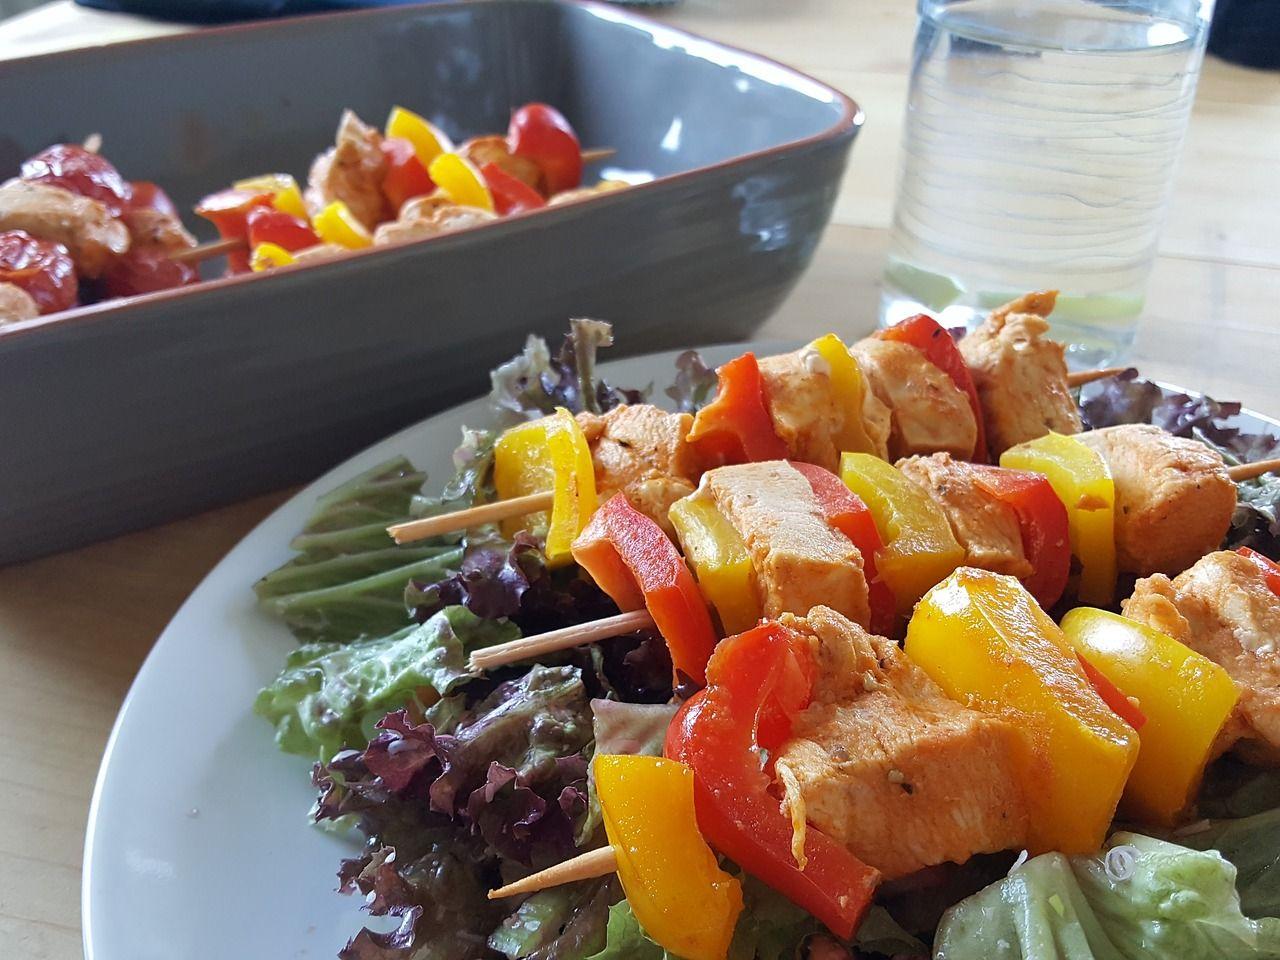 recetas fáciles de pollo